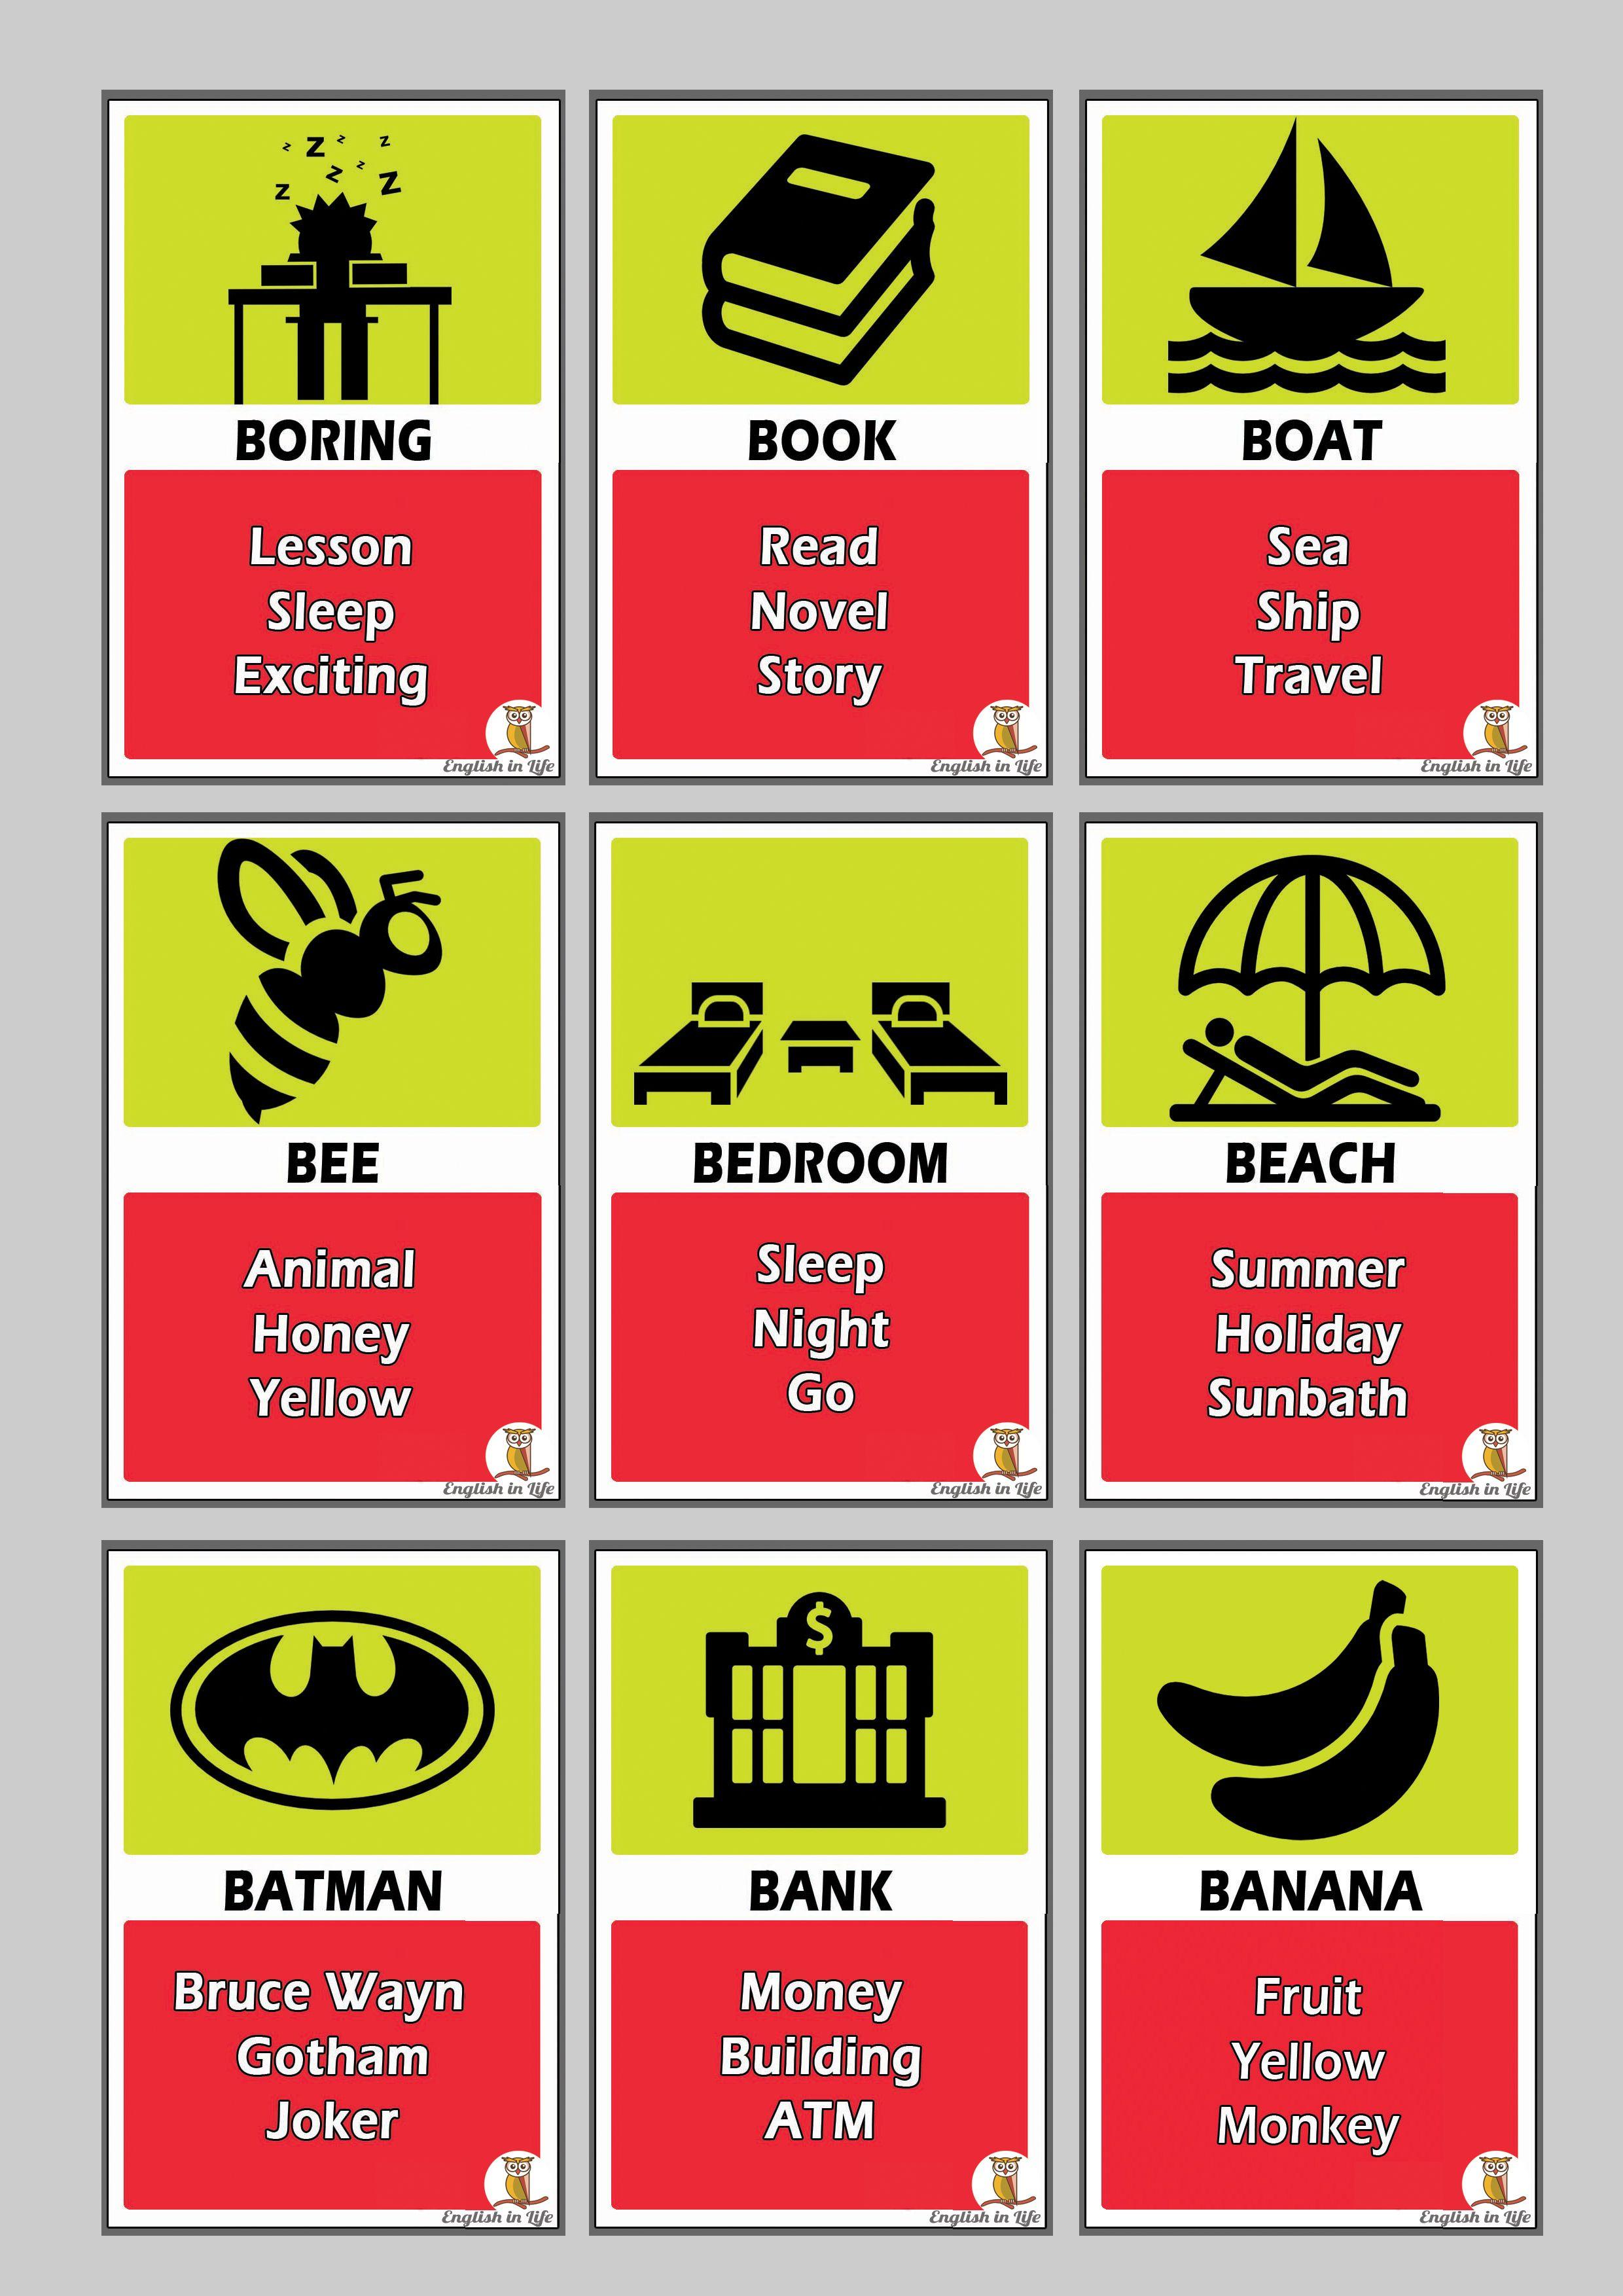 download taboo game cards free u2026 : Pinteresu2026